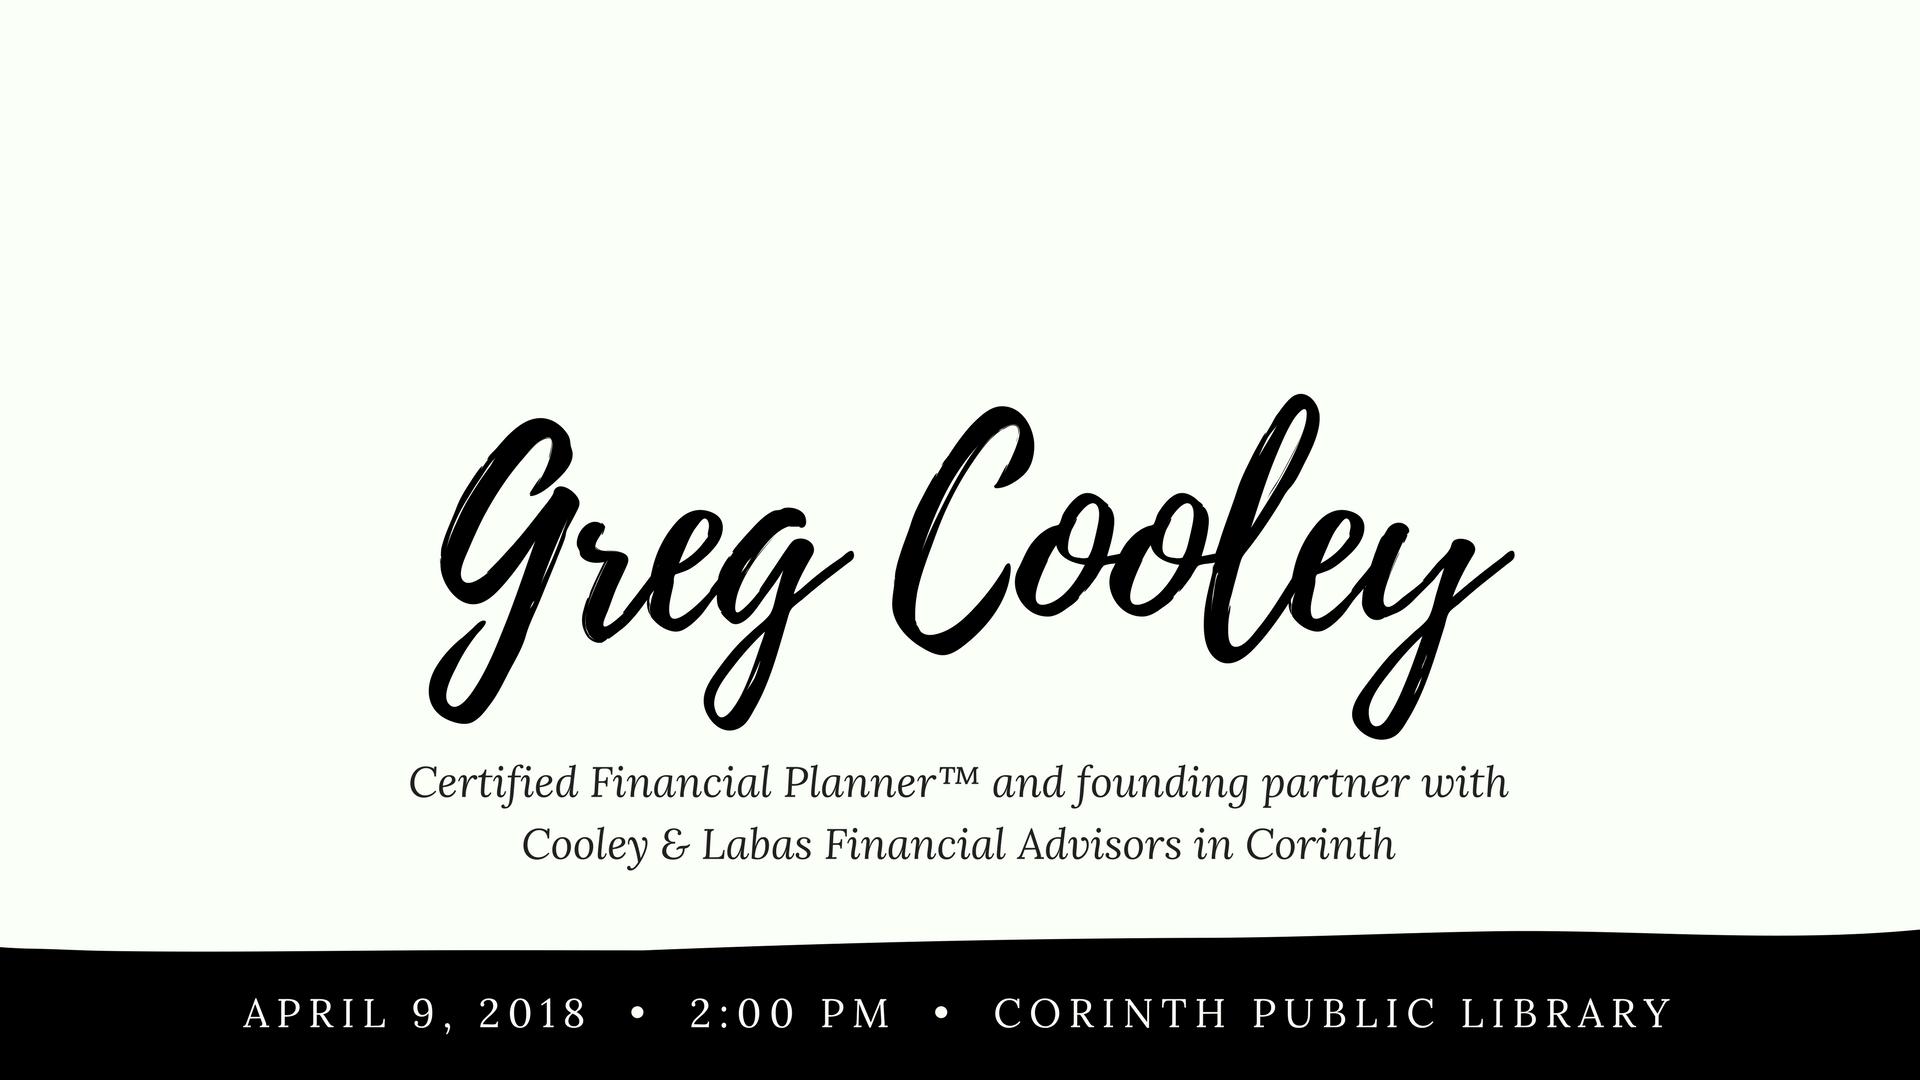 greg-cooley-banner